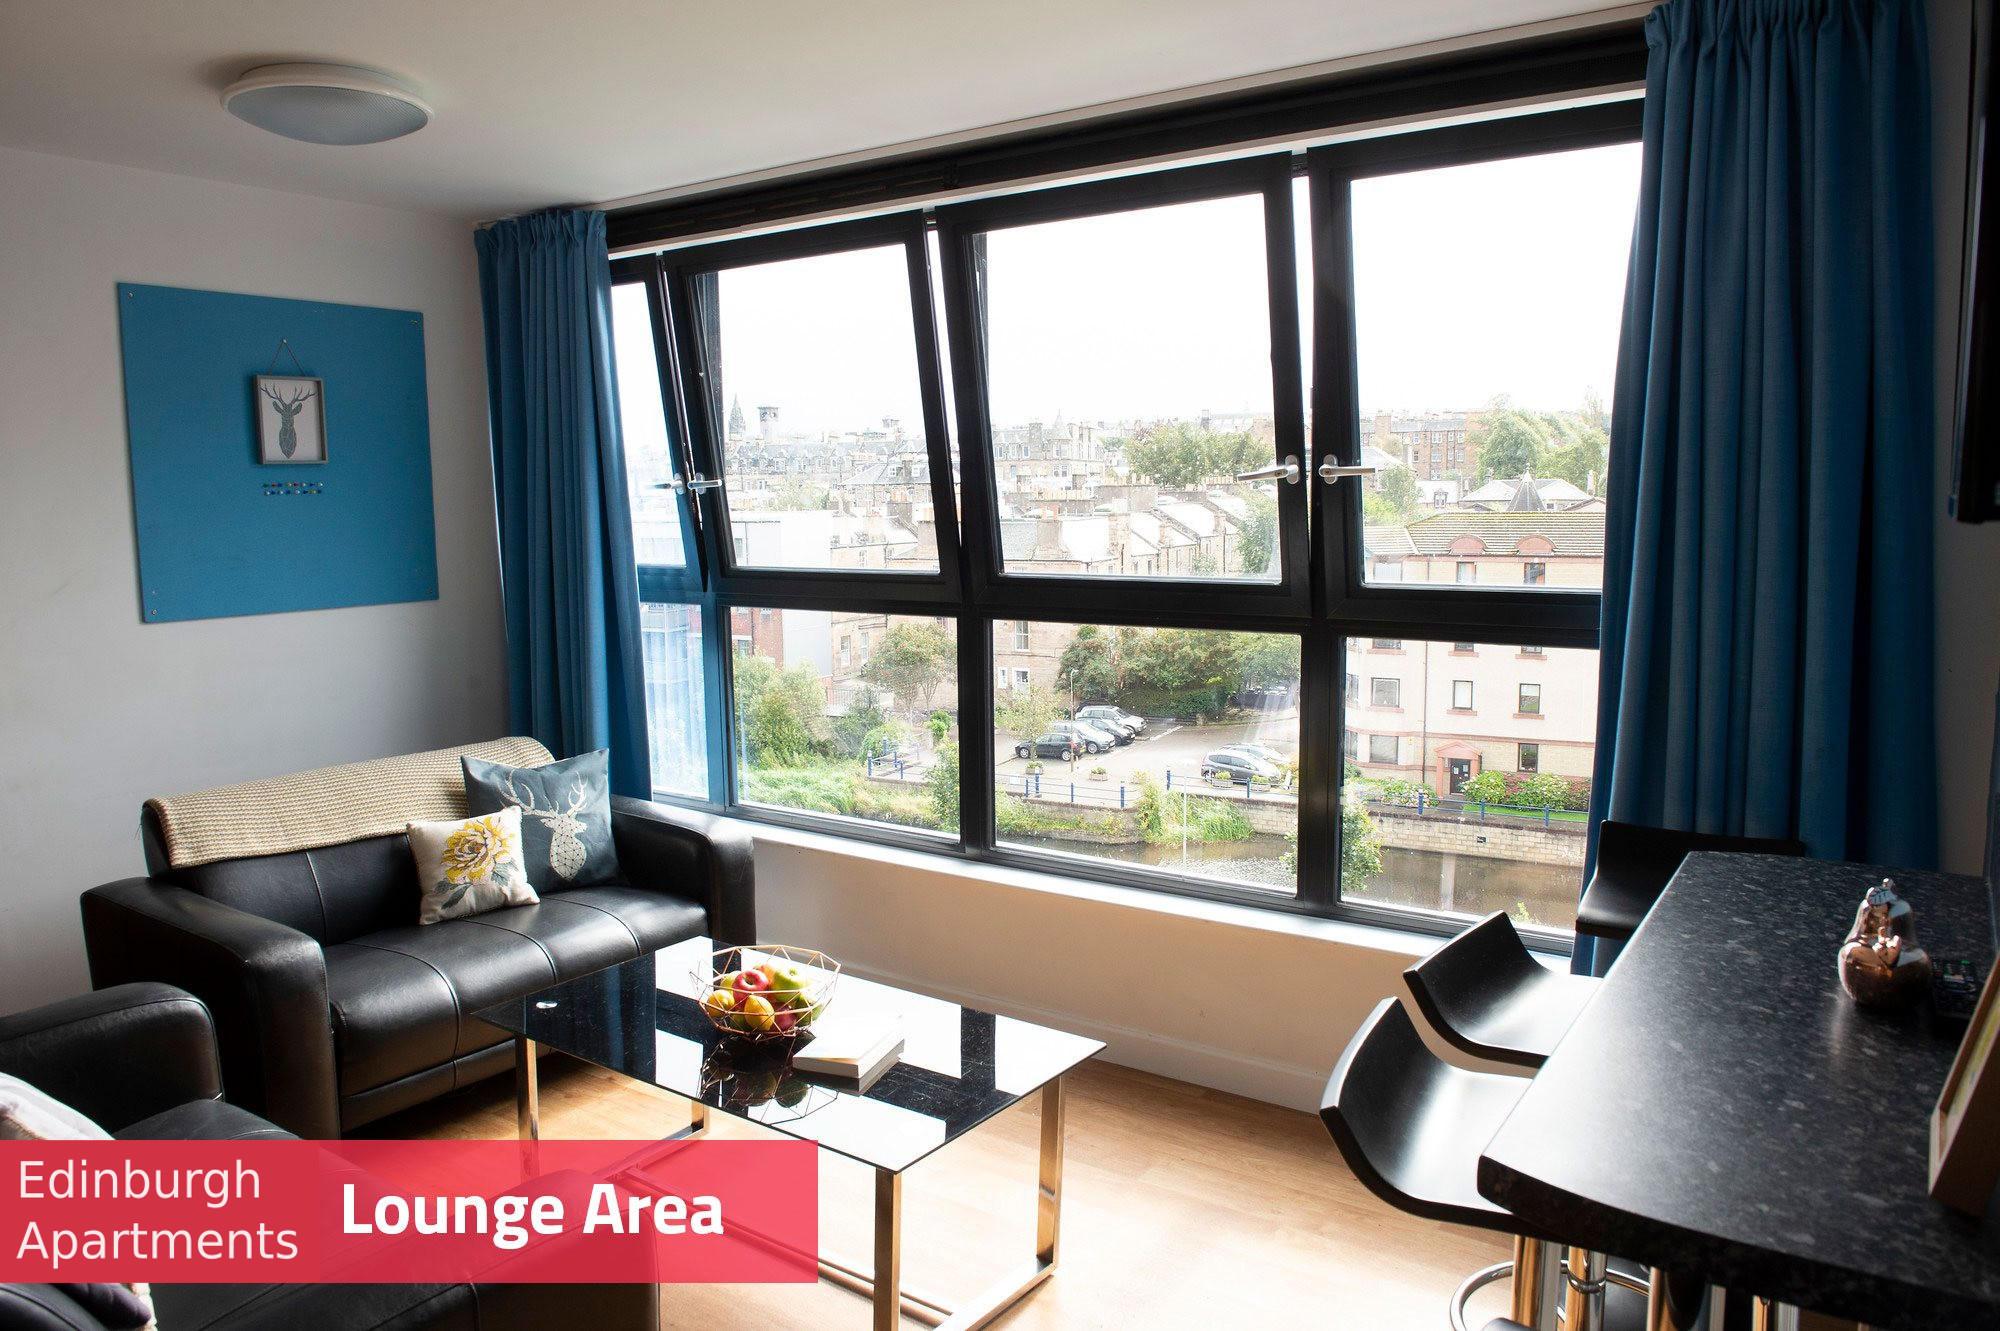 Edinburgh Apartments Edinburgh 8 Bedroom Apartments Fountainbridge